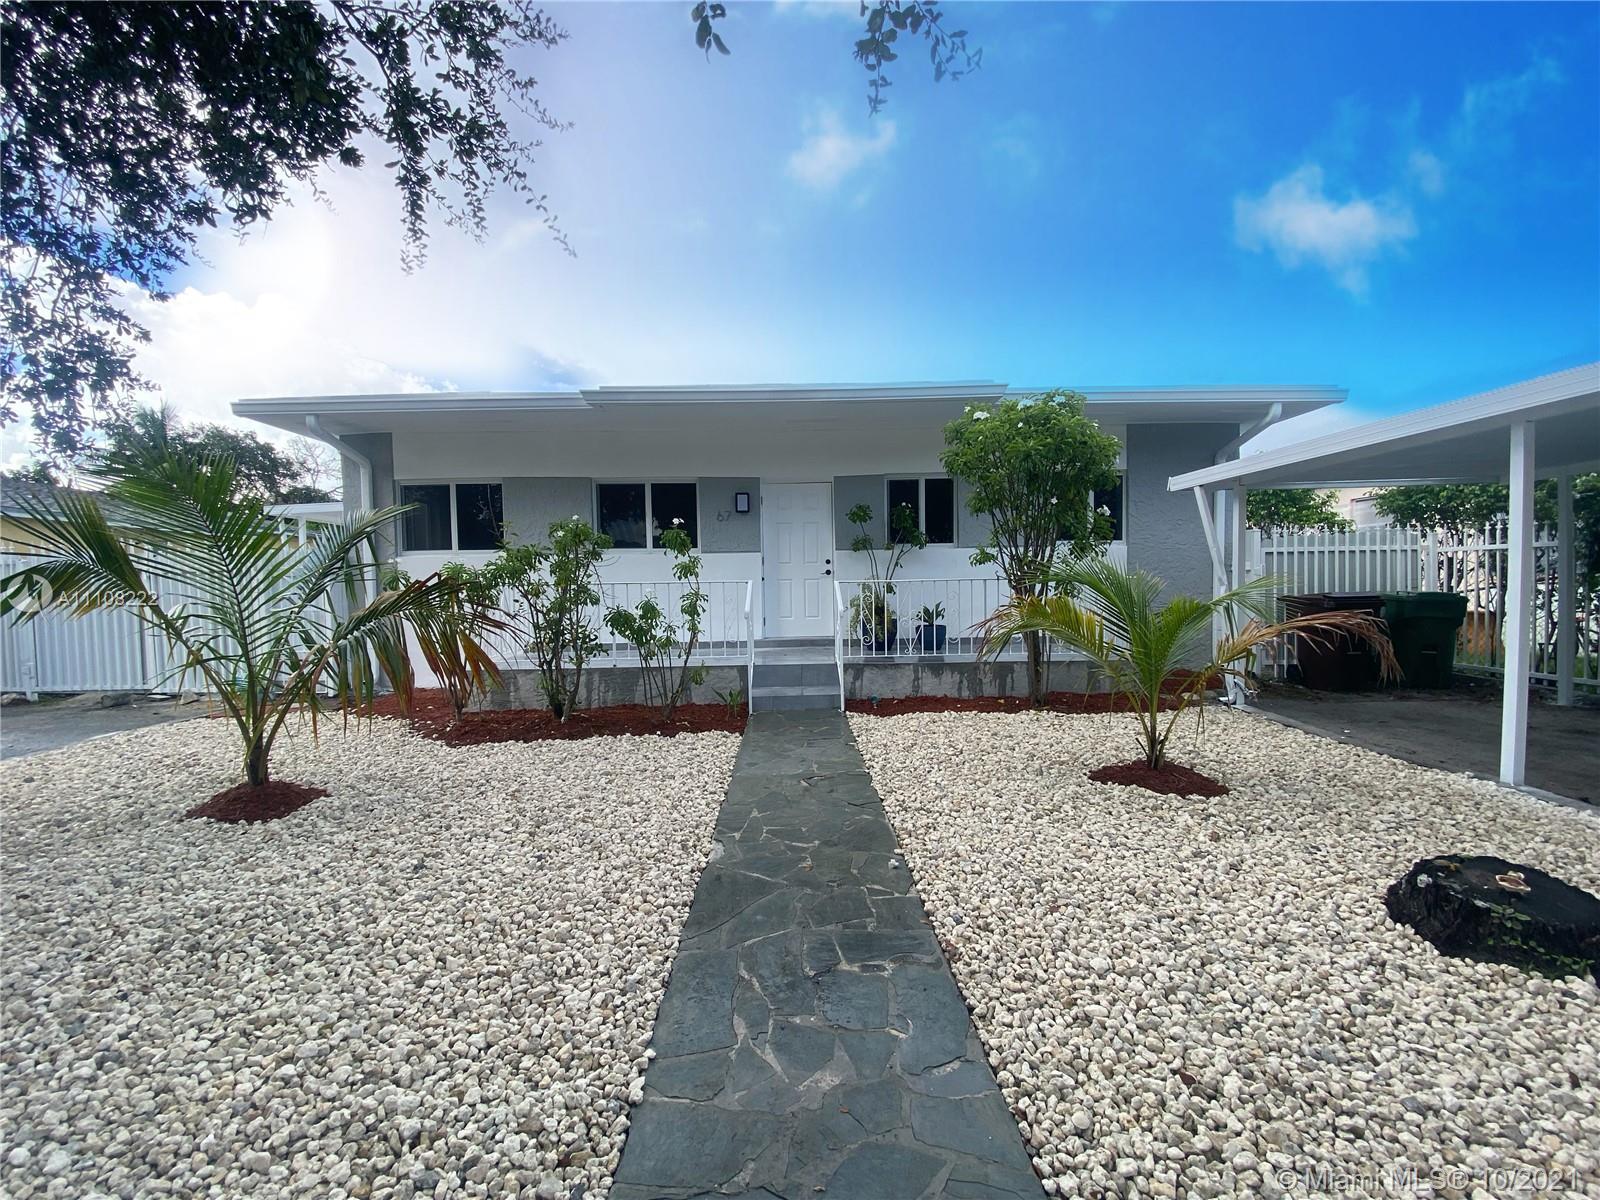 Single Family Home,For Sale,67 E 41st St, Hialeah, Florida 33013,Brickell,realty,broker,condos near me